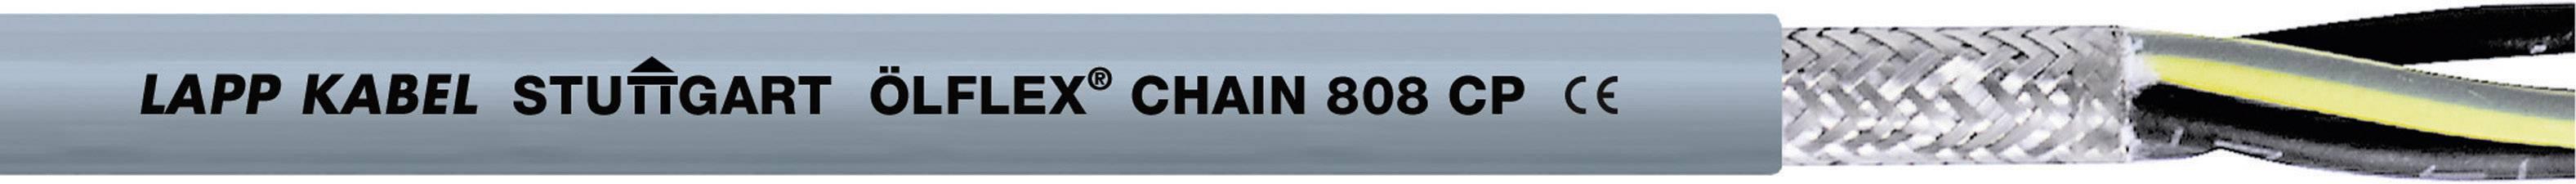 Žíla kabelu LappKabel ÖLFLEX CHAIN 808 CP 5G0,5 (1027754), 5x 0,5 mm², polyurethan, Ø 7,1 mm, stíněný, 50 m, š